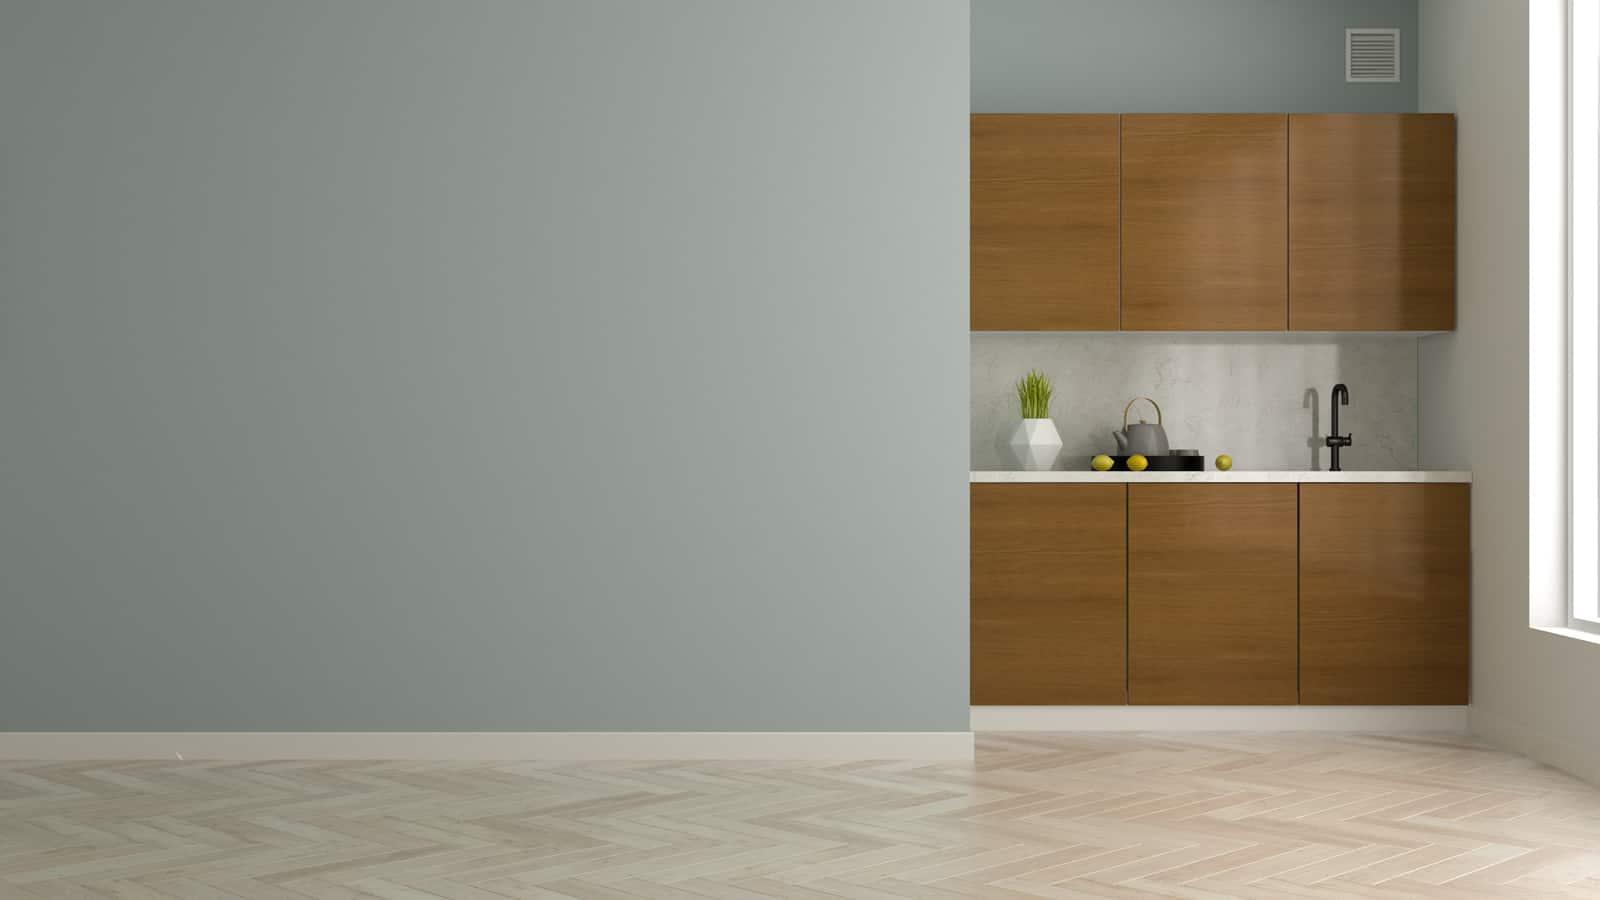 interior modern design room 3d illustration PKWGRC9 The Plus Addons for Elementor